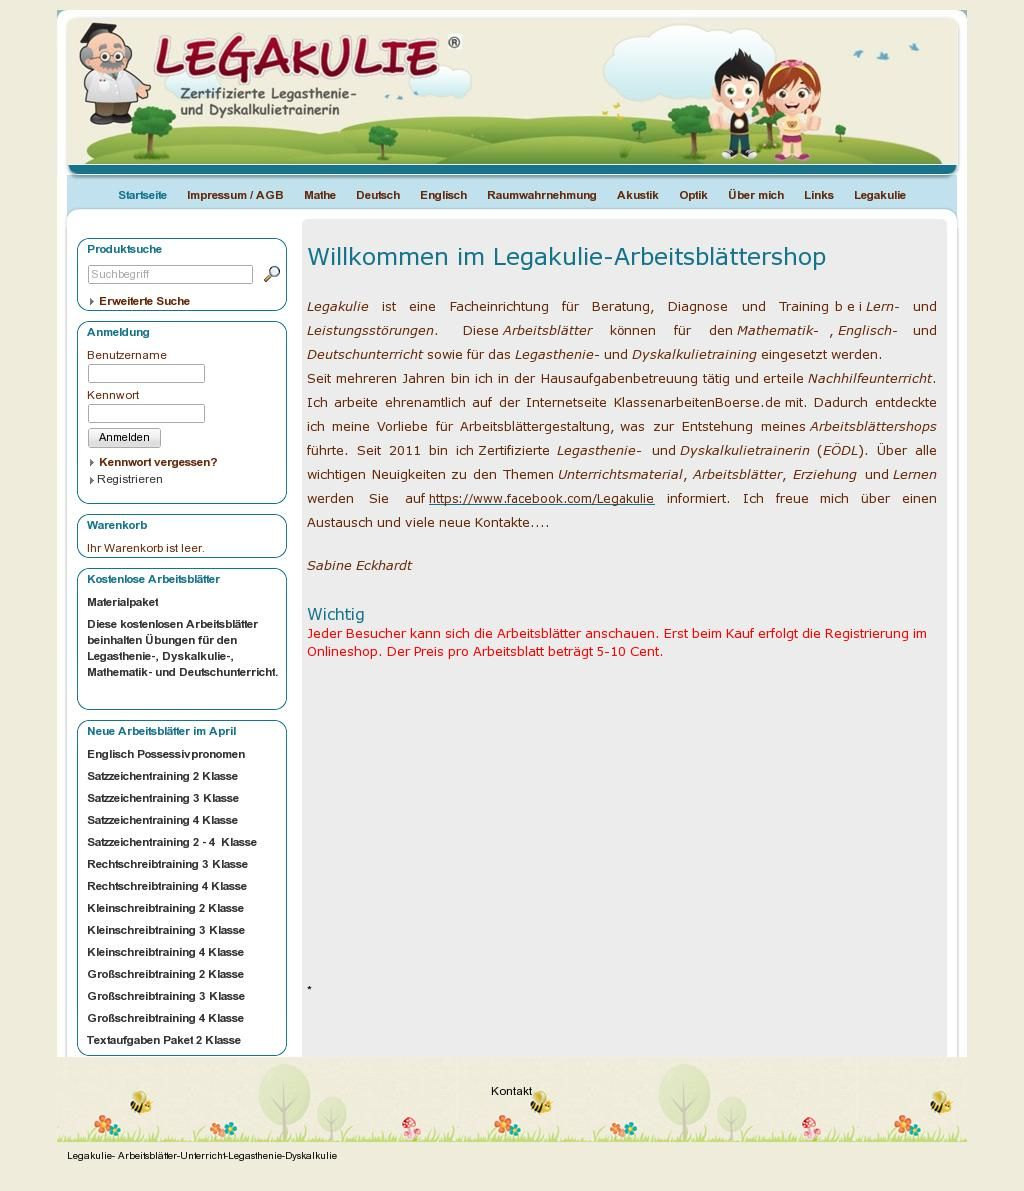 Legakulie-onlineshop | Legakulie Unterrichtsmaterial | Pinterest